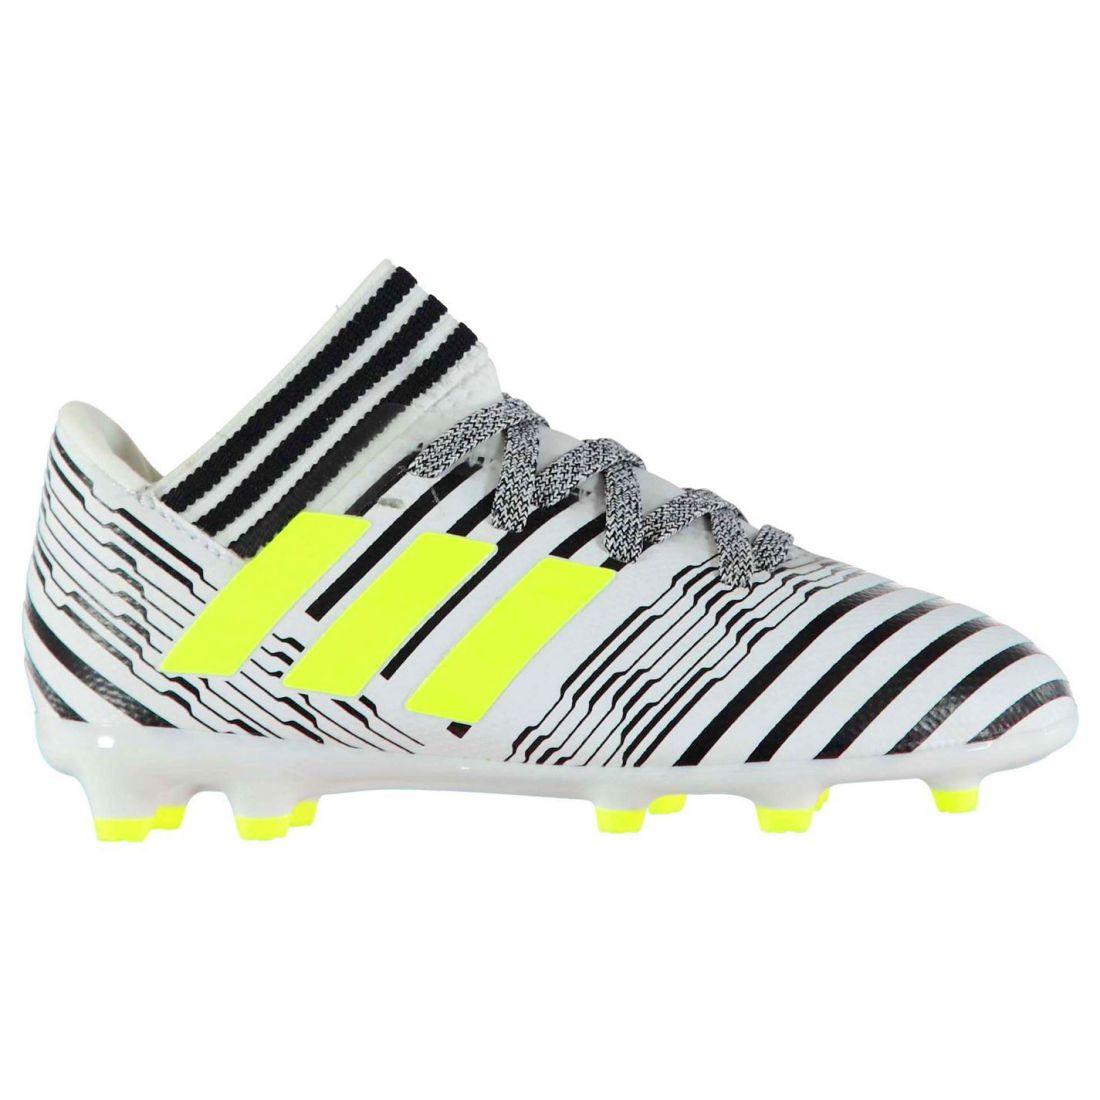 adidas Kids Boys Nemeziz 17.3 Firm Ground Football Boots Shoes Lace Up  Sports e8f8b31b8c2